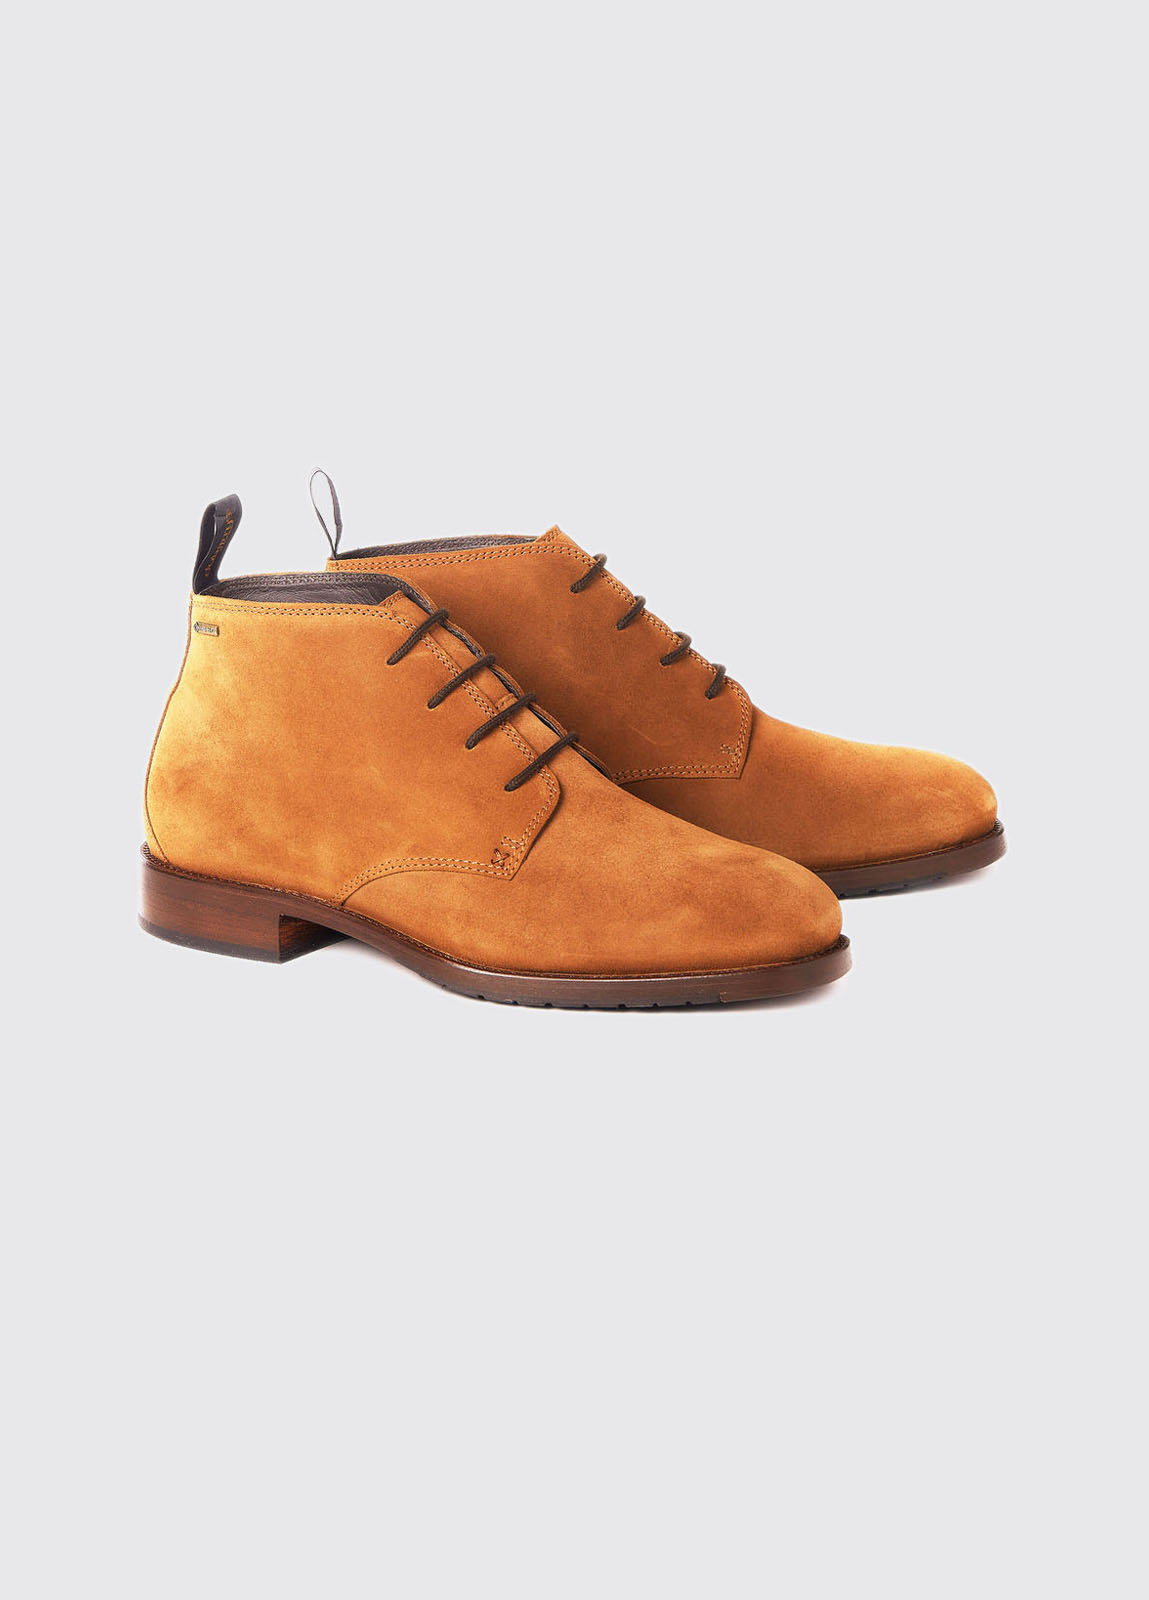 Kilgarvan Lace-up Boot - Camel